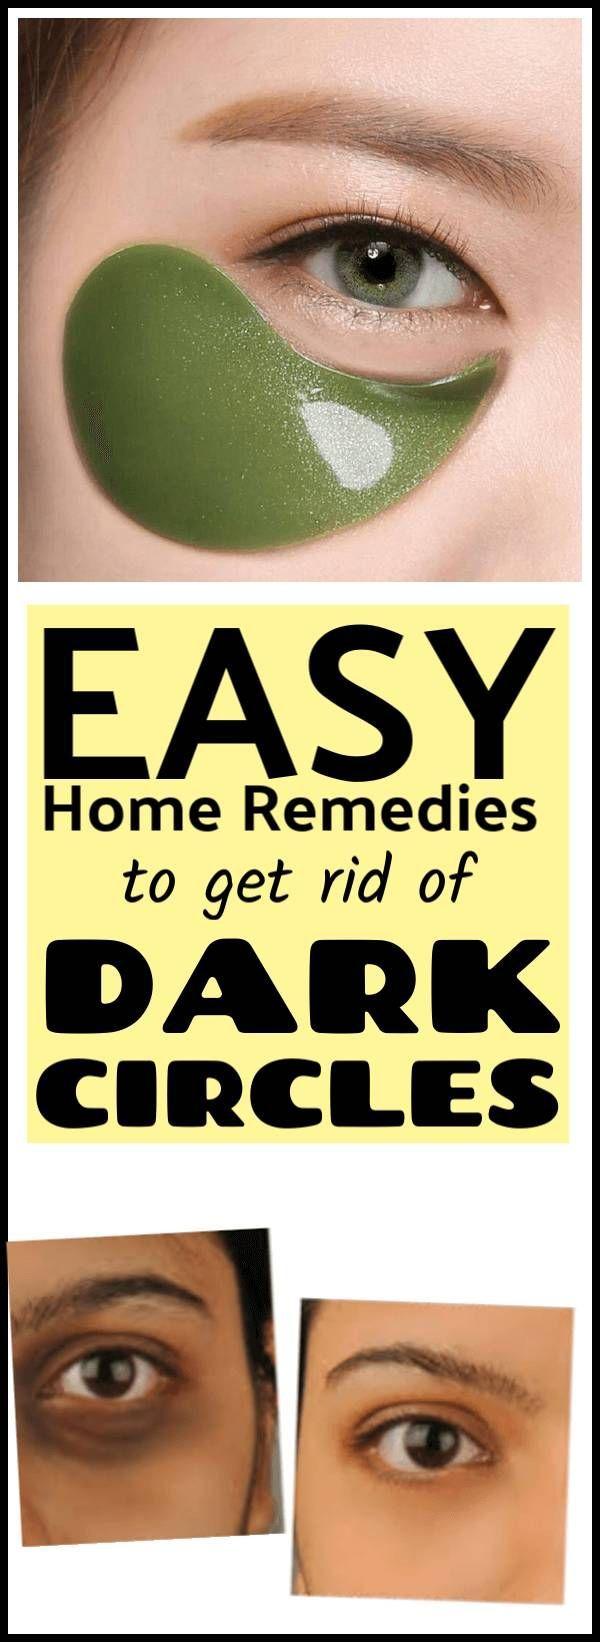 How To Remove Dark Circles Naturally At Home Remove dark